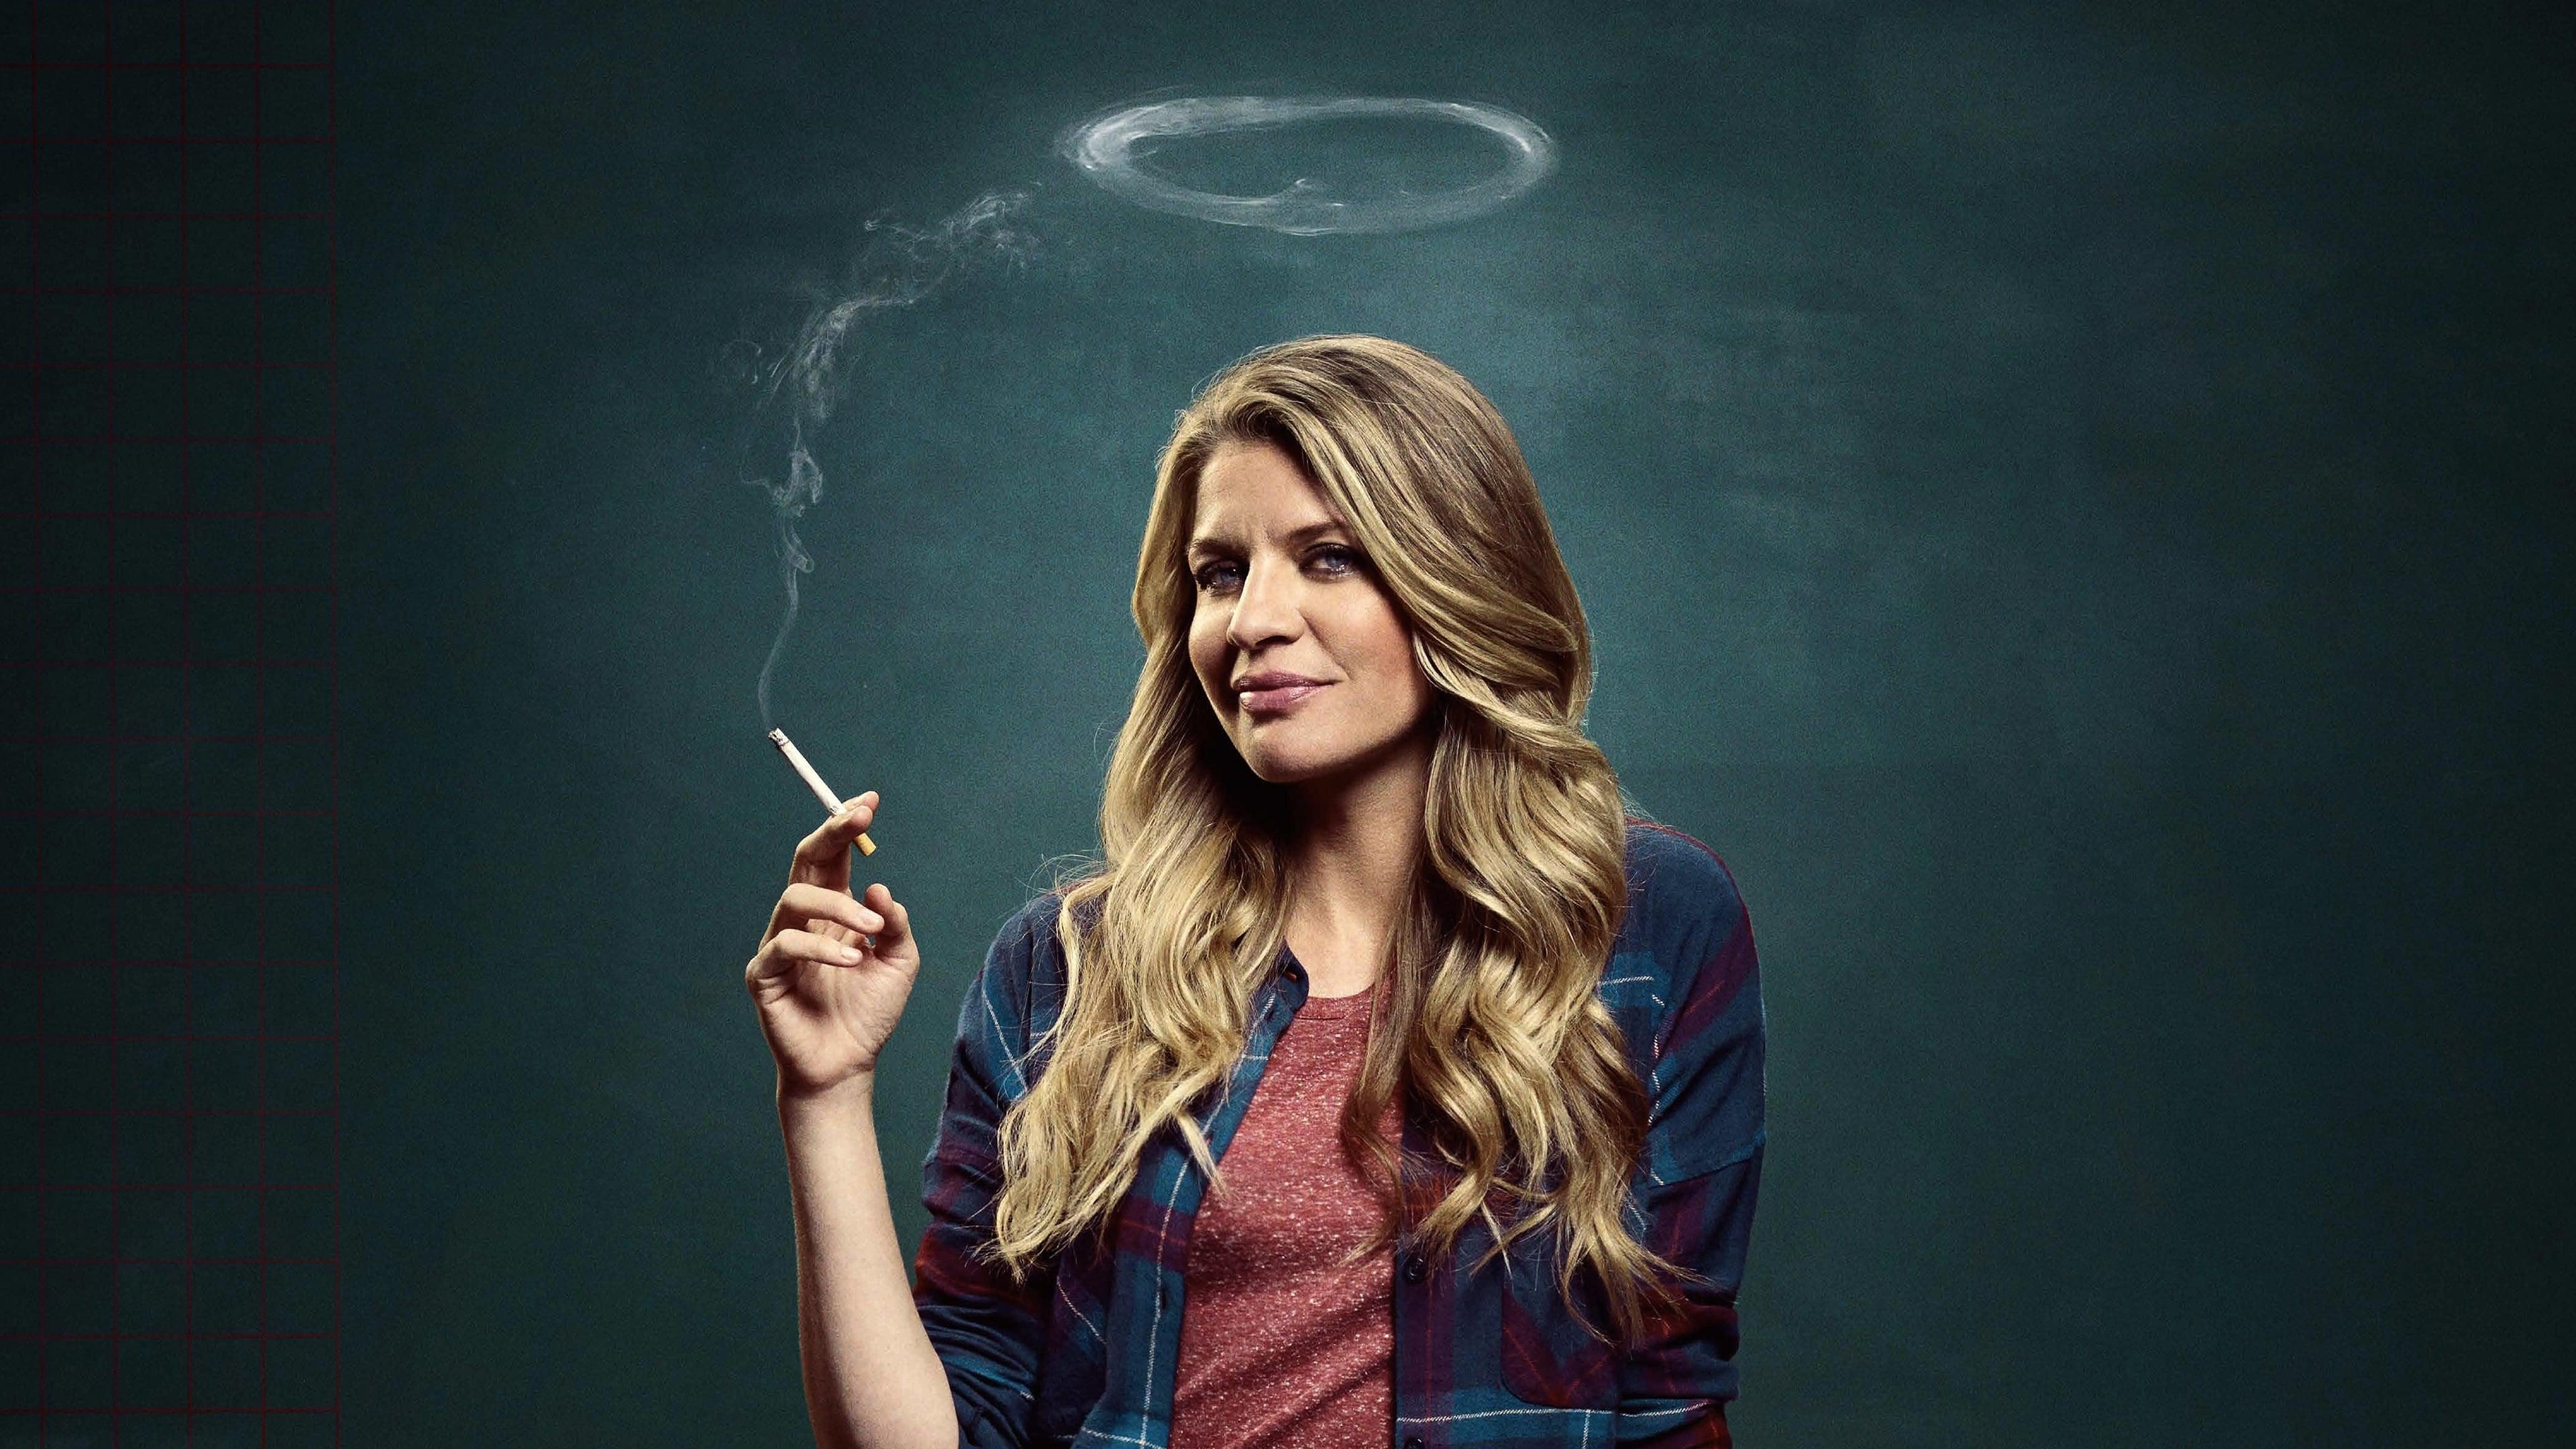 Fifth season Rita to release on Netflix soon